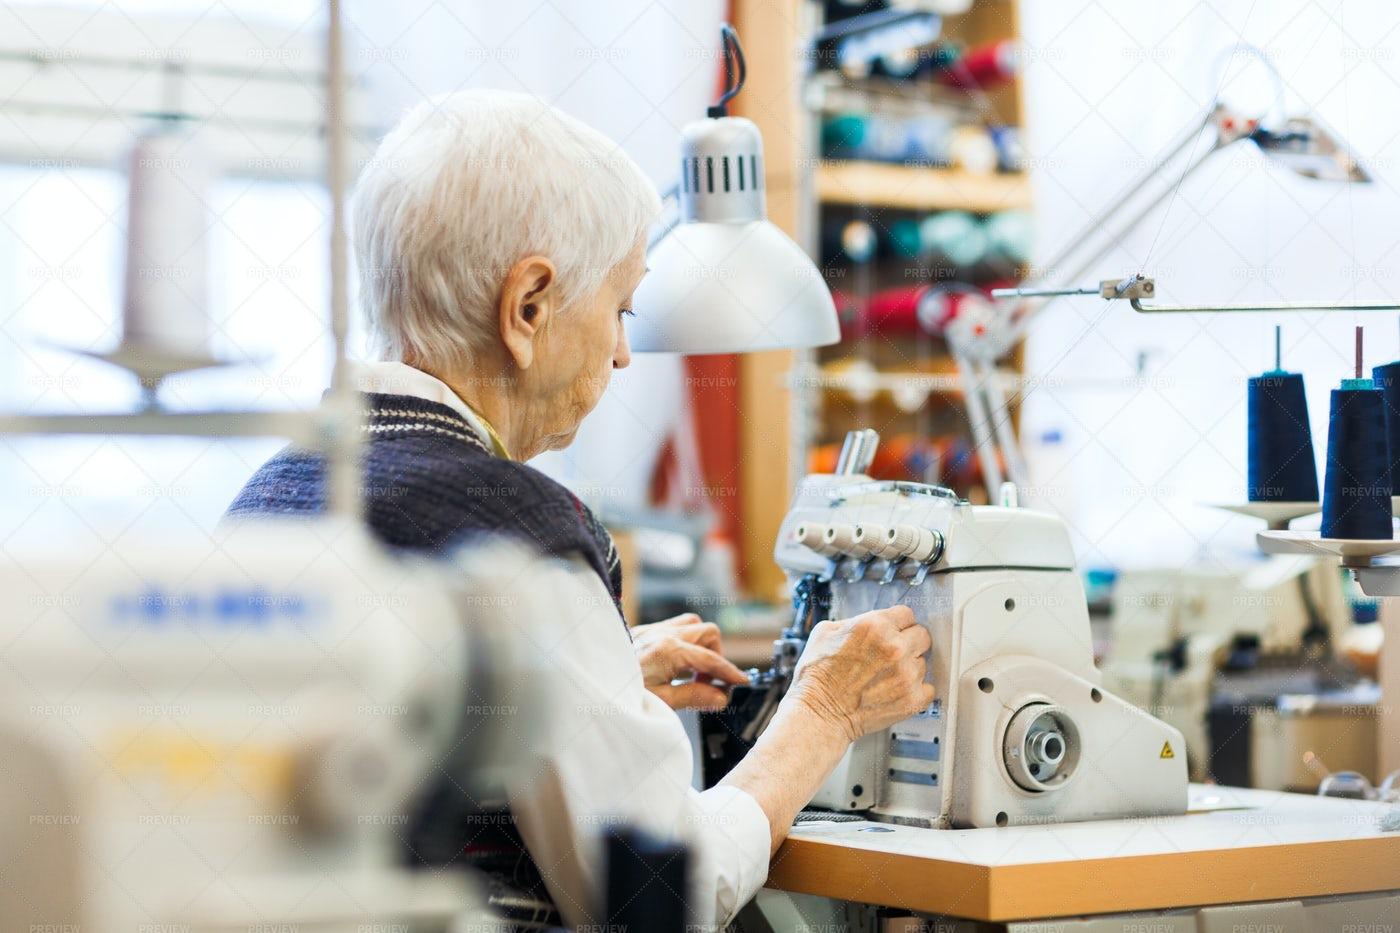 Sewing Clothes: Stock Photos